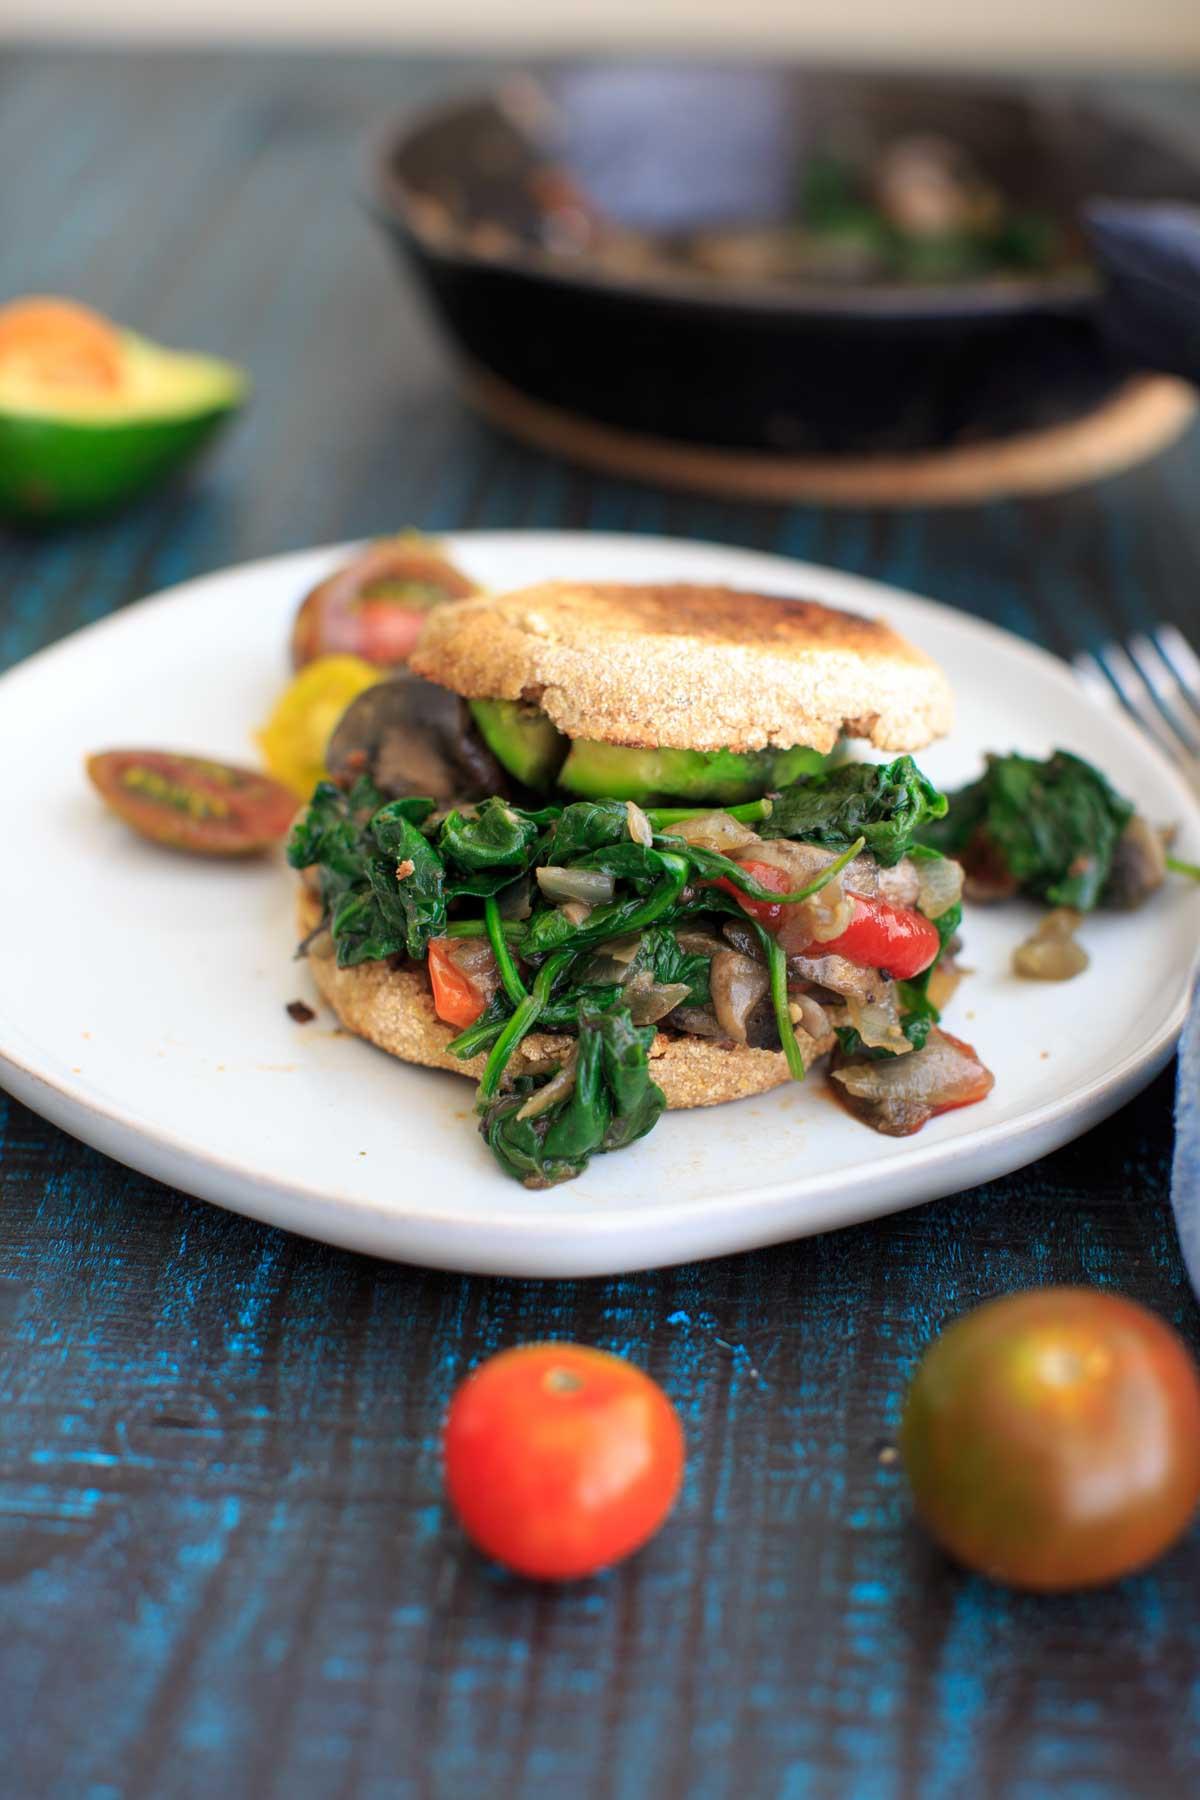 Vegetarian Breakfast Recipes For Weight Loss  Healthy Vegan Breakfast Ideas Fit Foo Finds